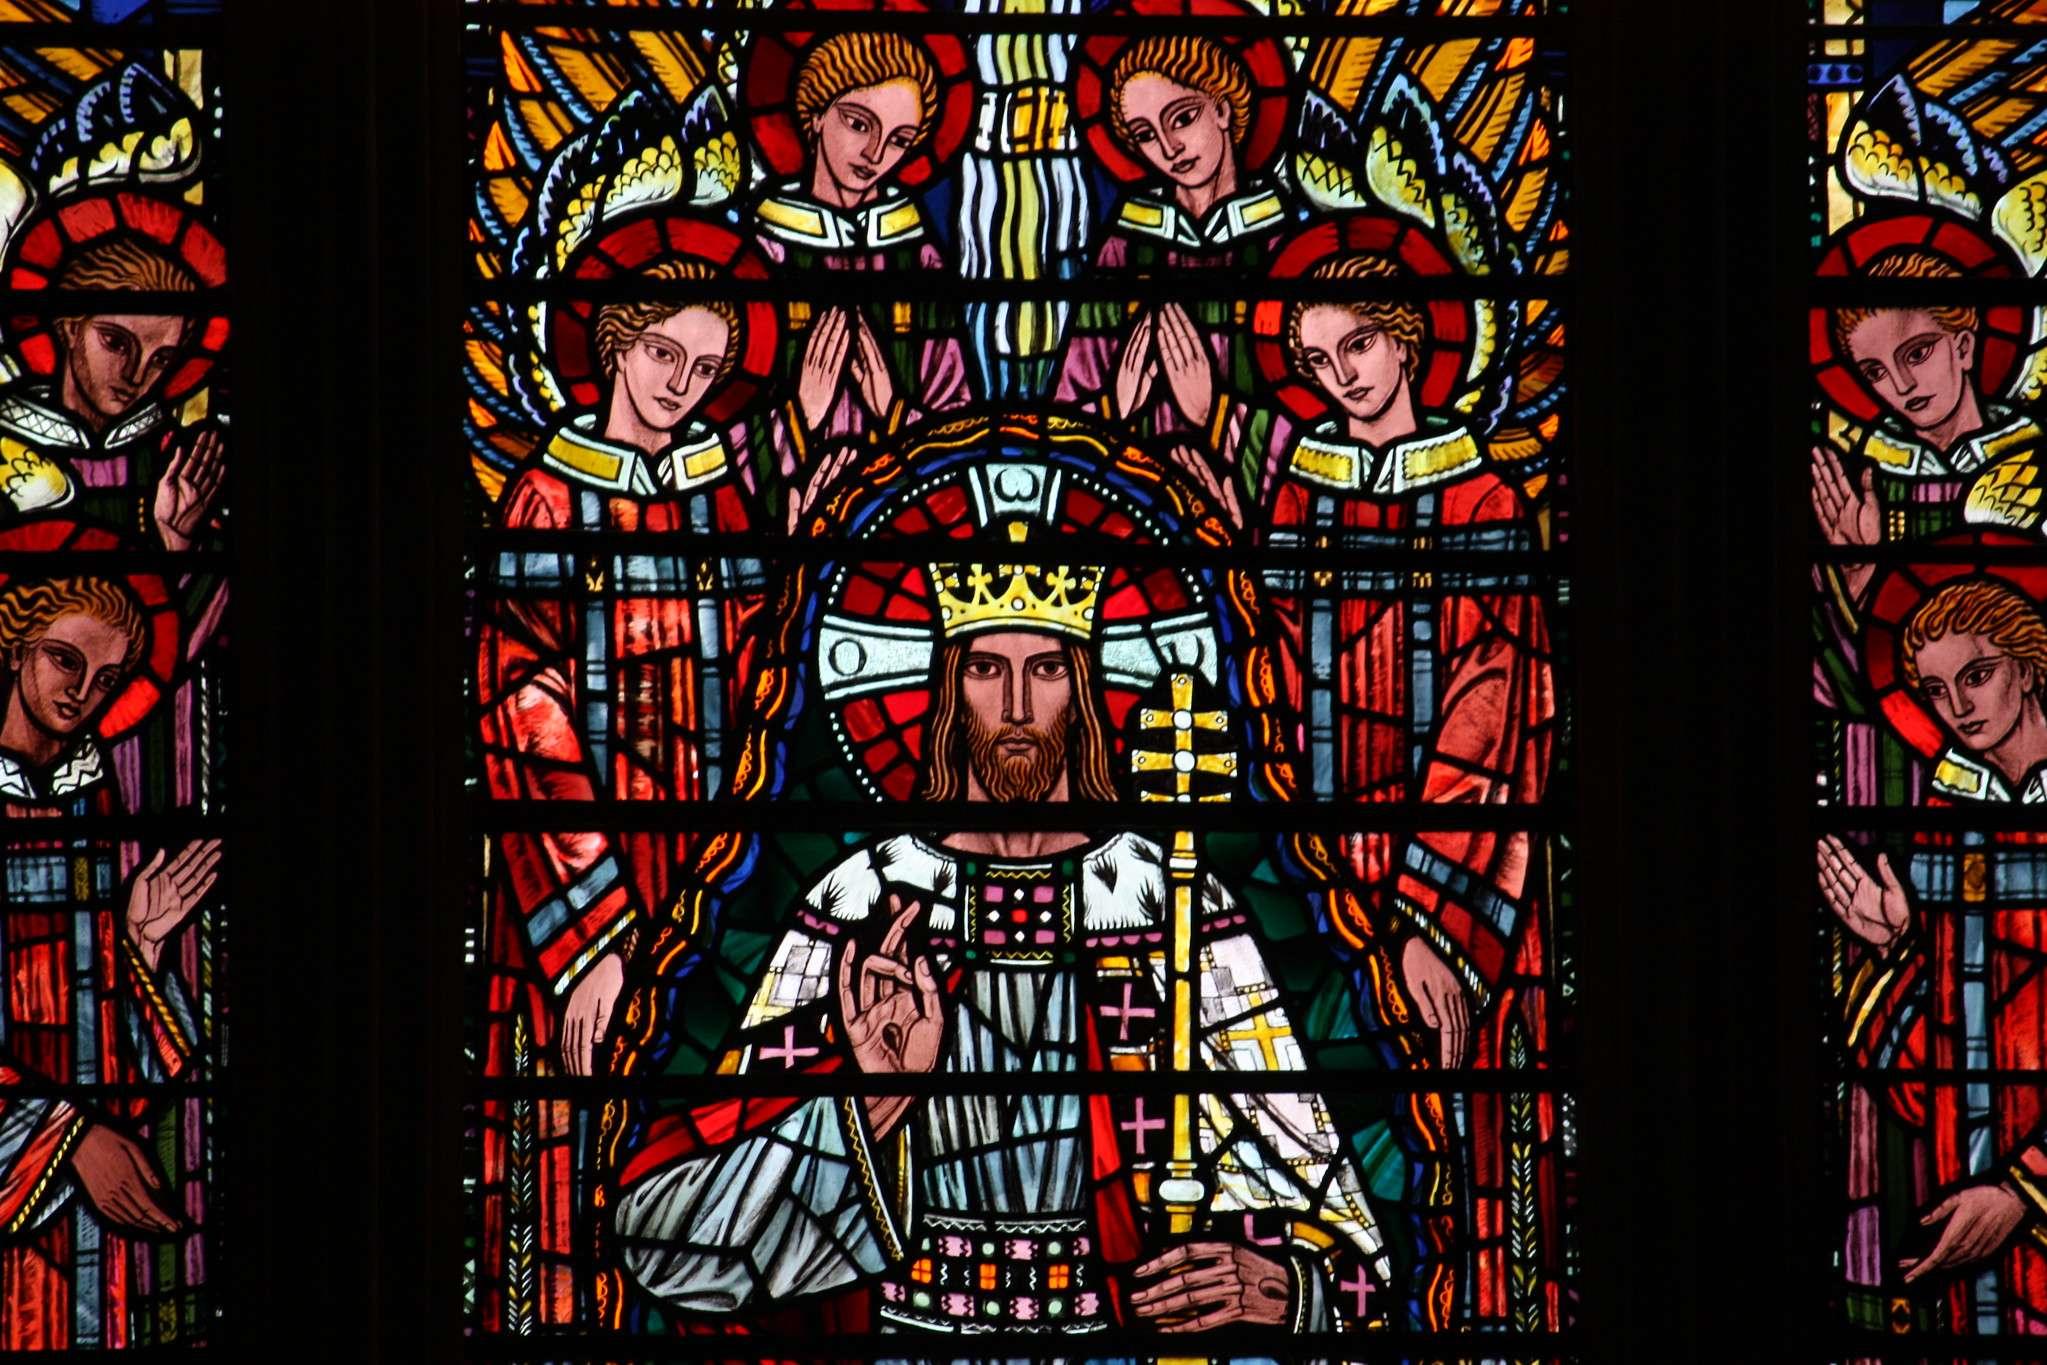 Christ the King at St Etheldreda's, London.